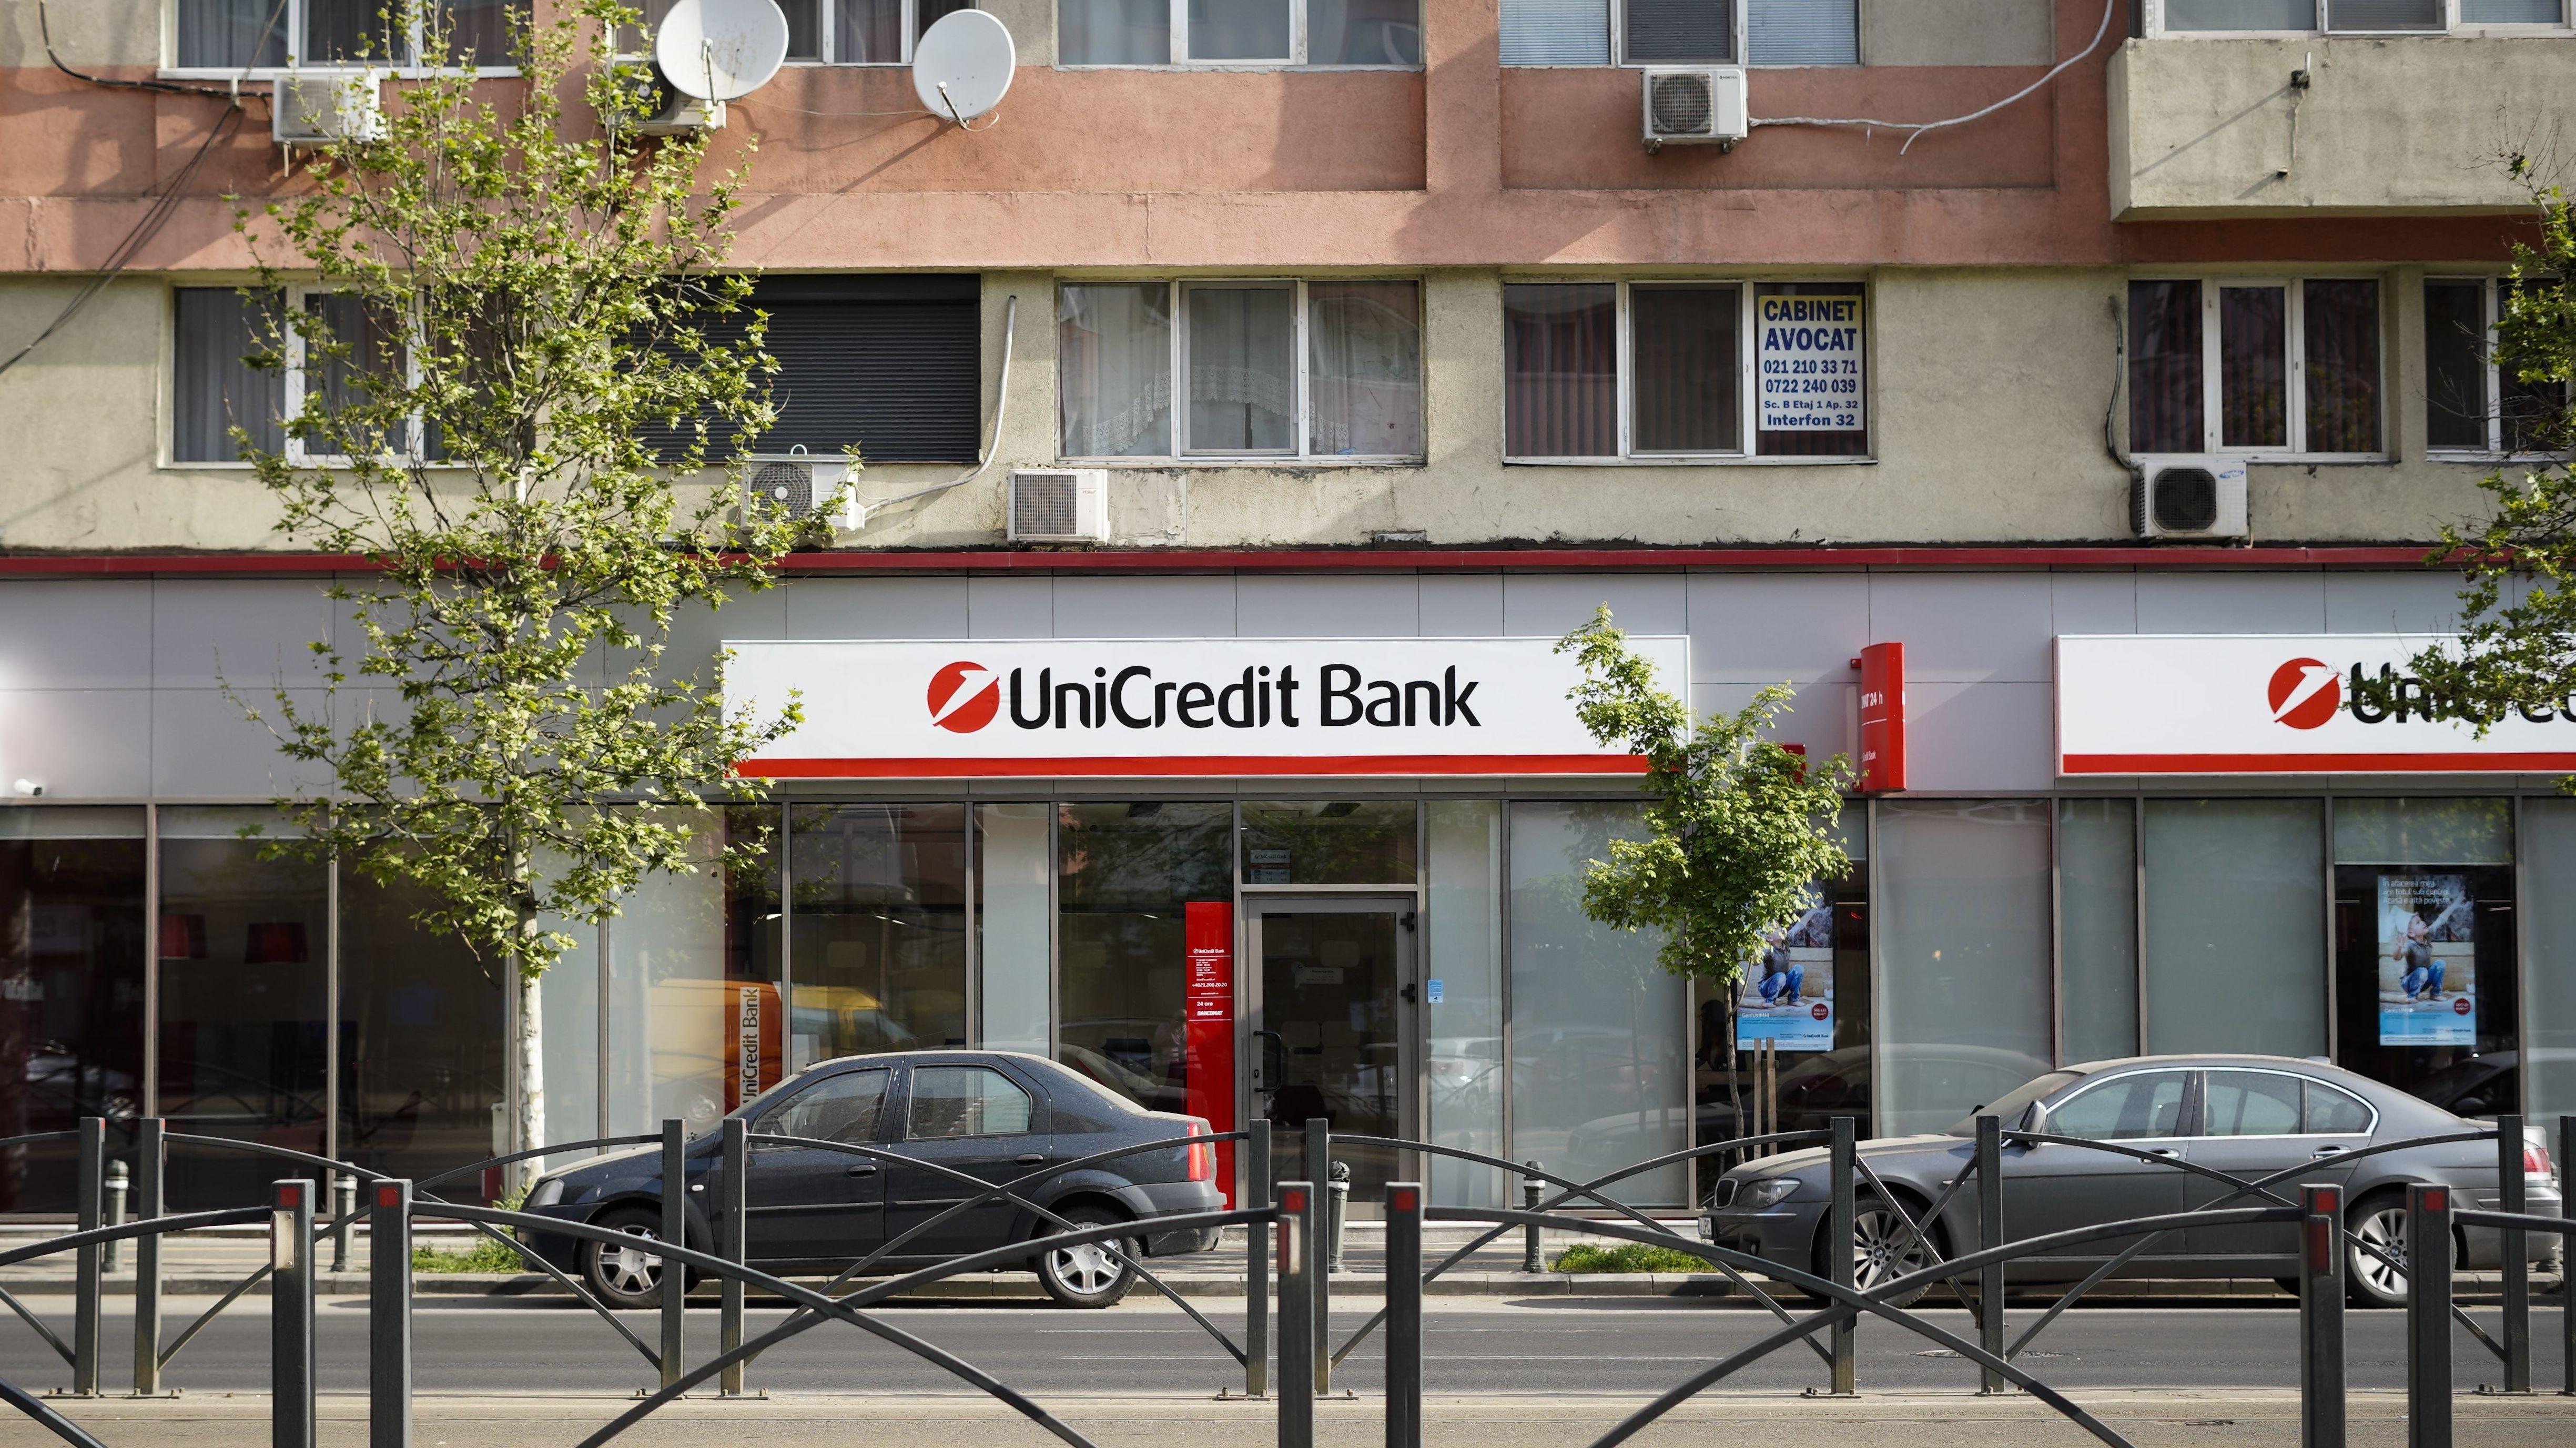 Filiale der Unicredit